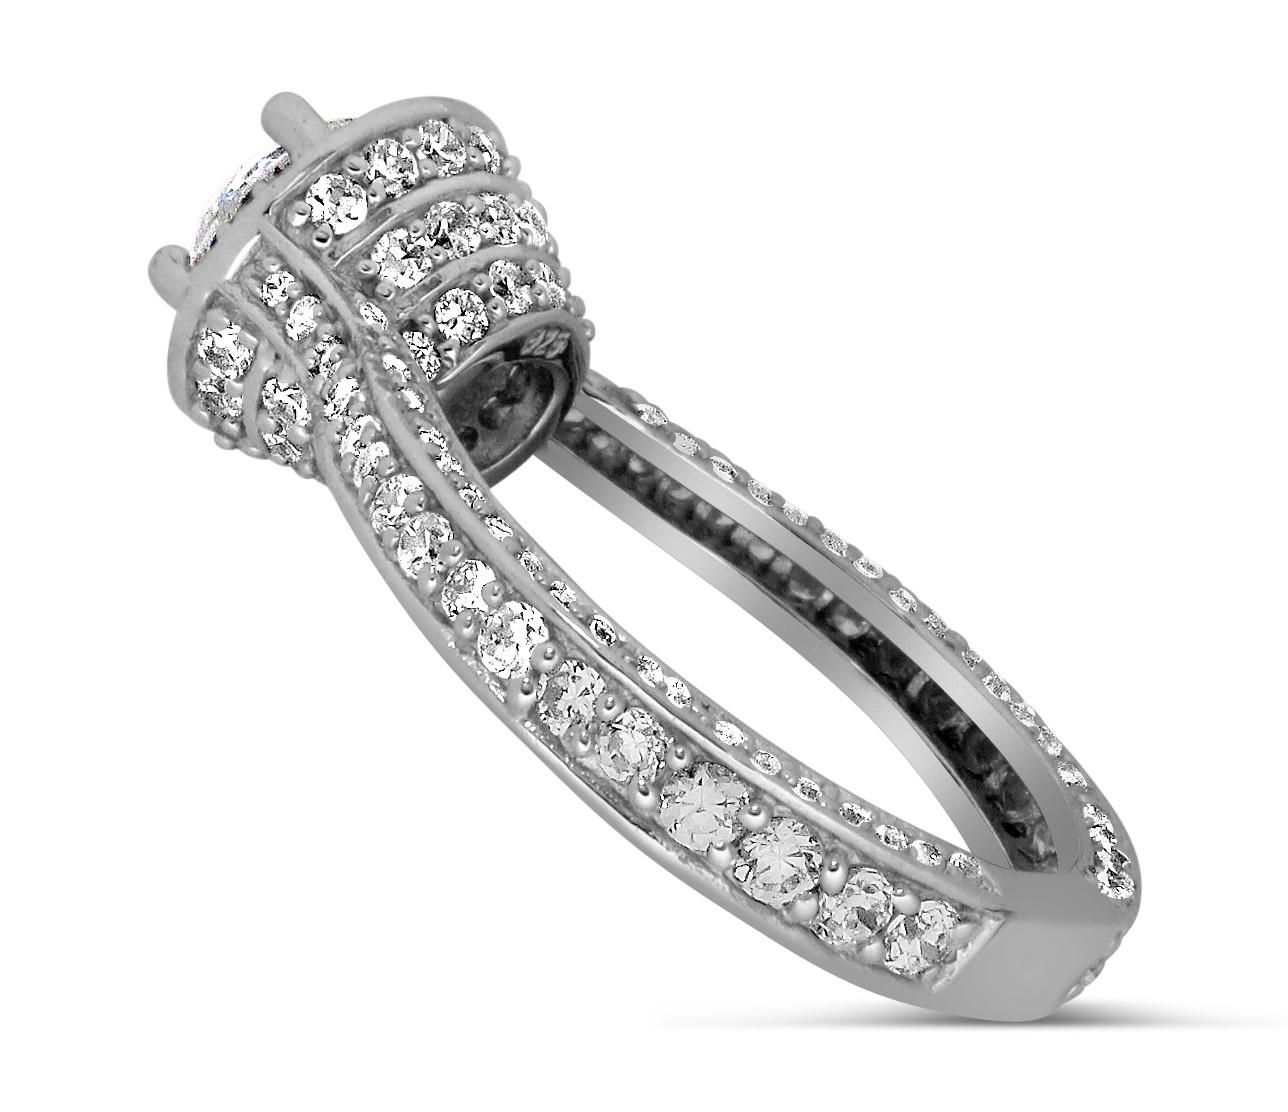 designer 1 carat round halo diamond engagement ring for women in white gold jeenjewels. Black Bedroom Furniture Sets. Home Design Ideas